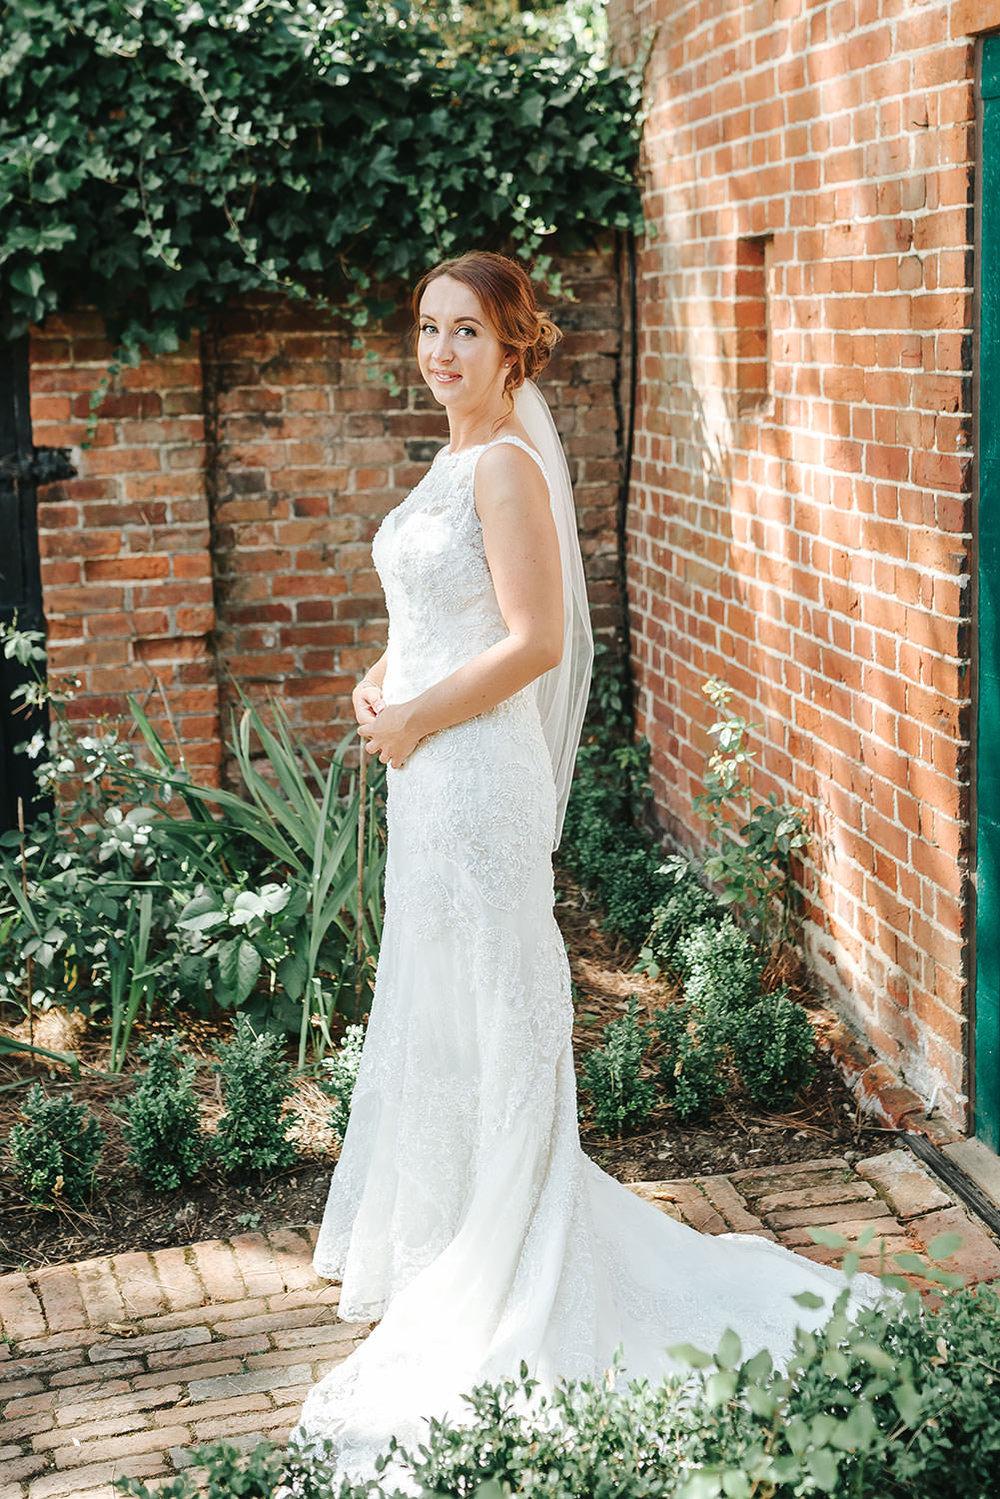 essex-wedding-photographer-gaynes-park-photographer-46.jpg